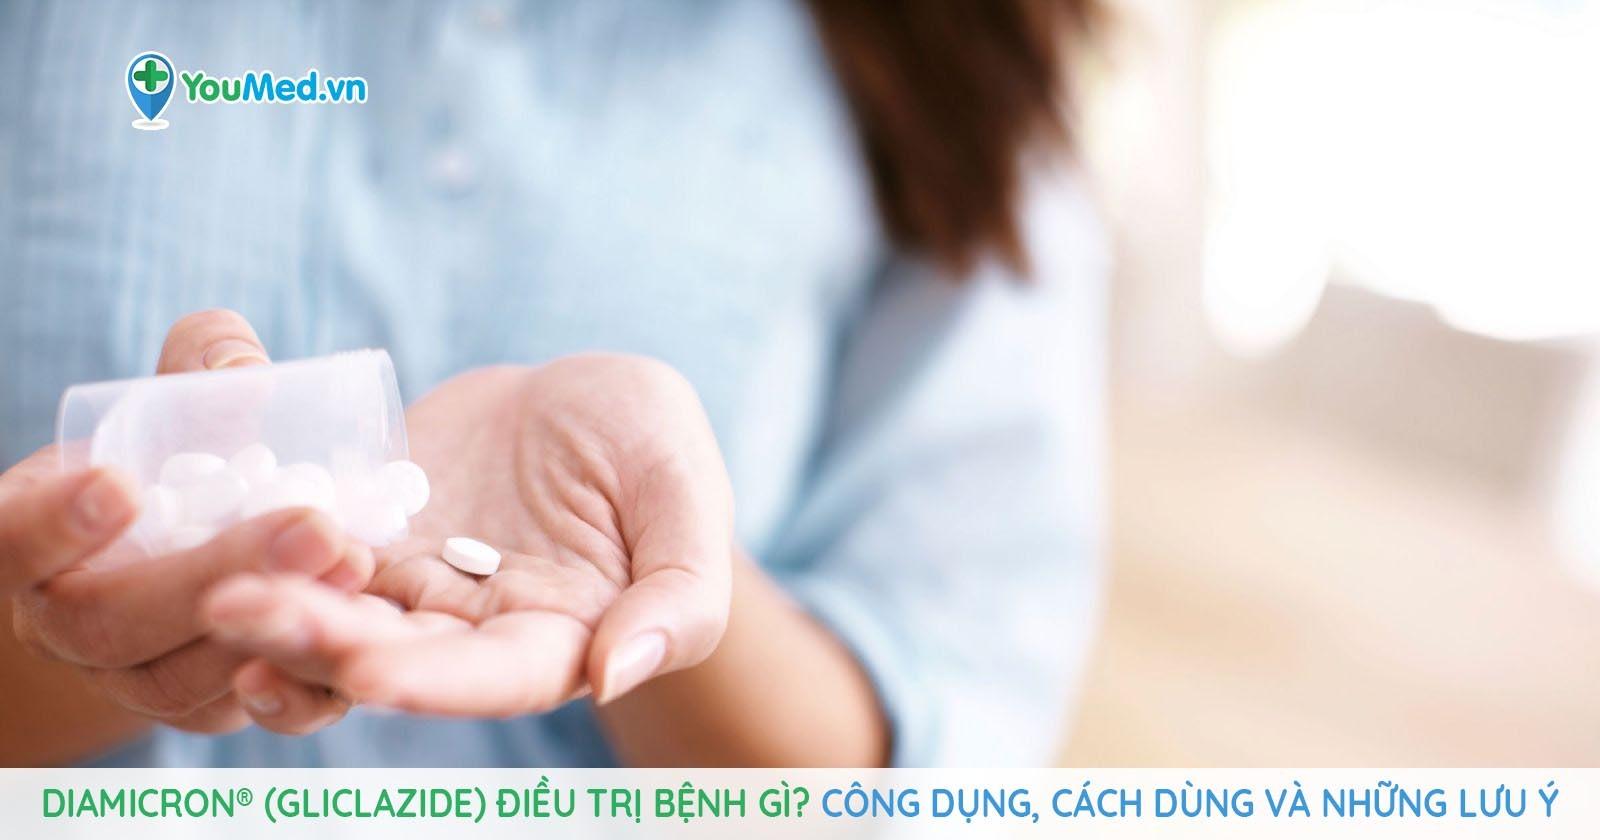 Thuốc Diamicron ® (Gliclazide) điều trị bệnh gì?